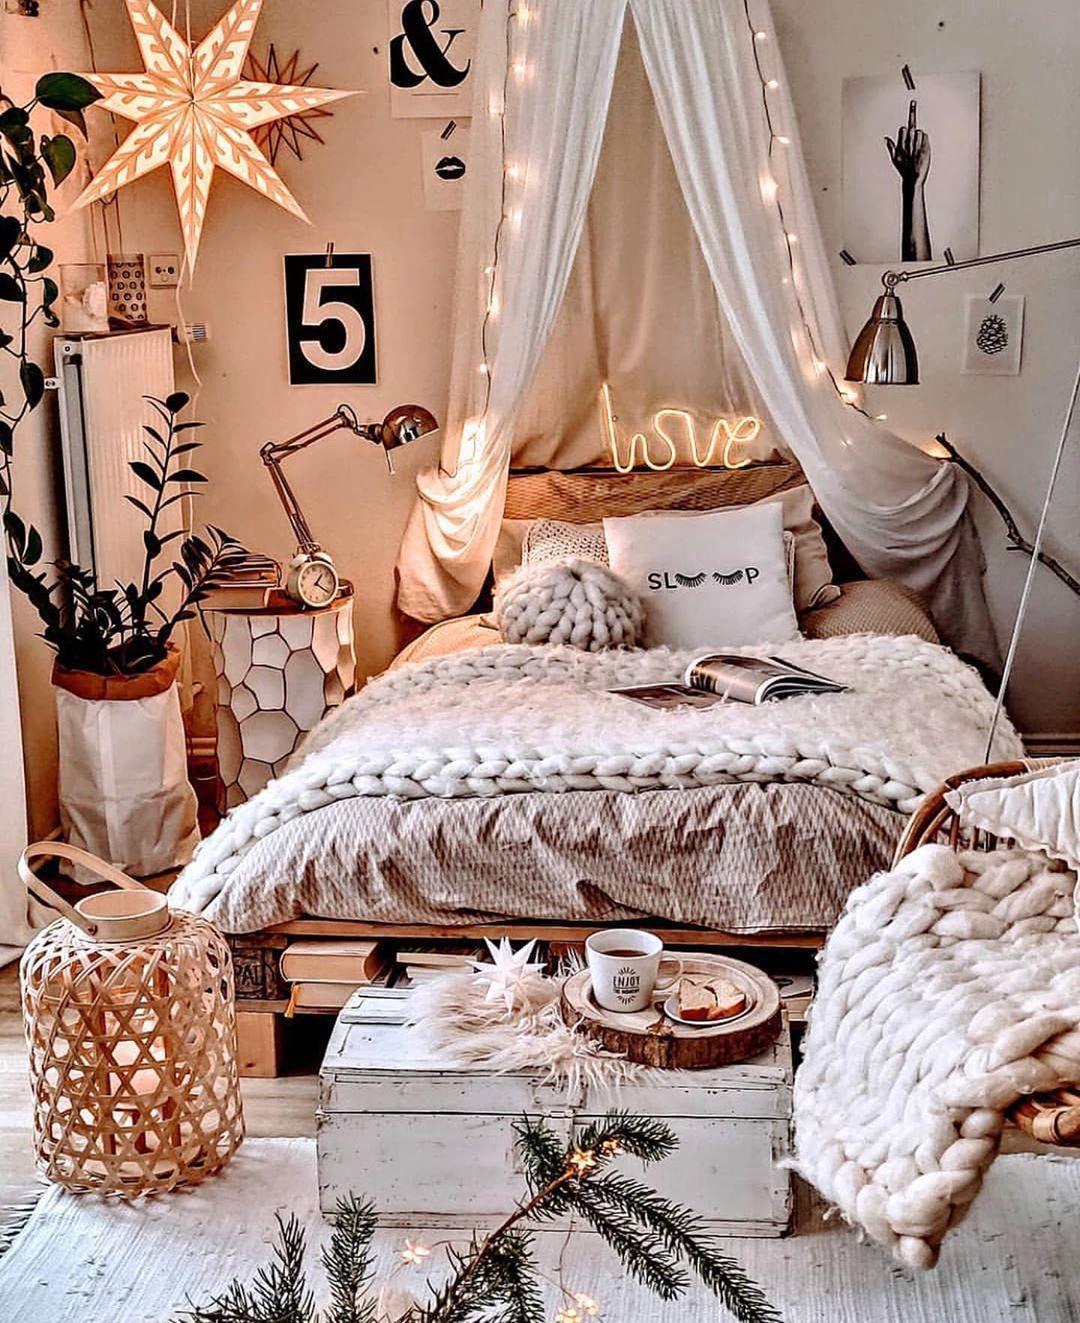 Factors For Better Online Furniture Shopping Room Inspiration Bedroom Room Design Bedroom Bedroom Decor